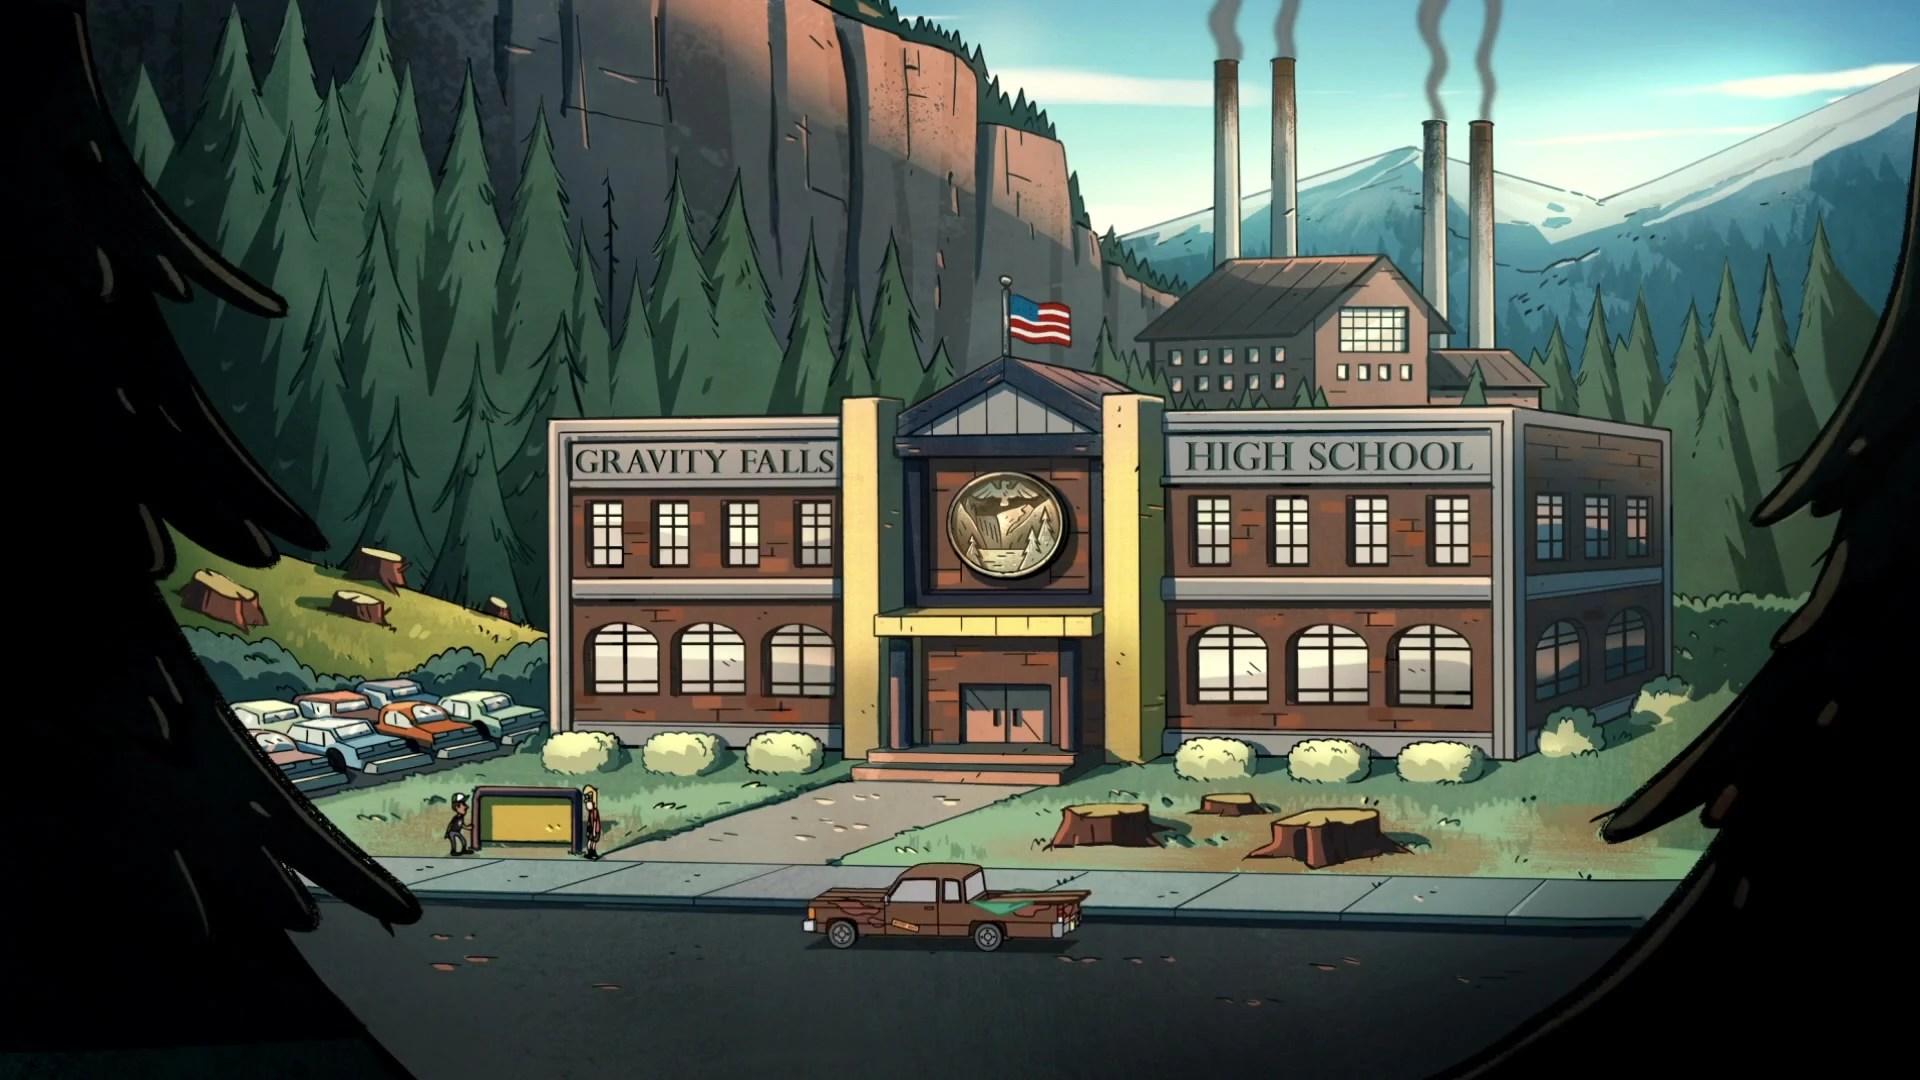 Screen Shot Wallpaper Gravity Falls Gravity Falls High School Gravity Falls Wiki Fandom